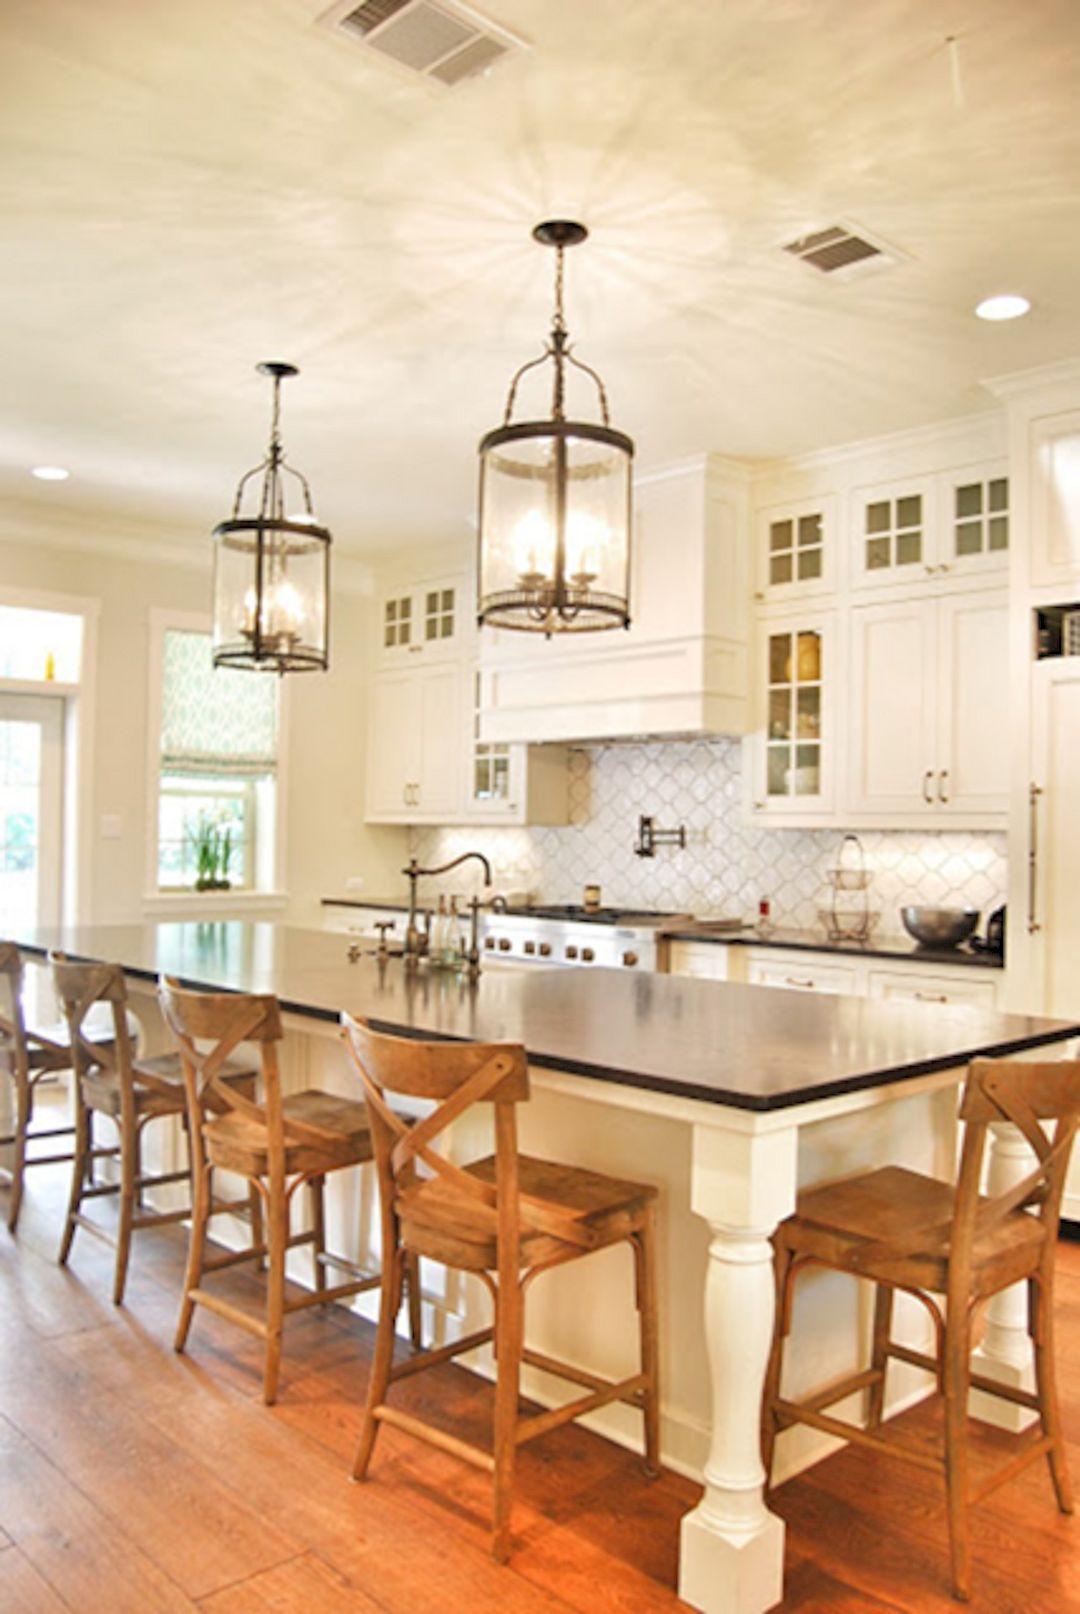 Best 5 Kitchen Island Styles For Your Home Kitchen Design 640 x 480